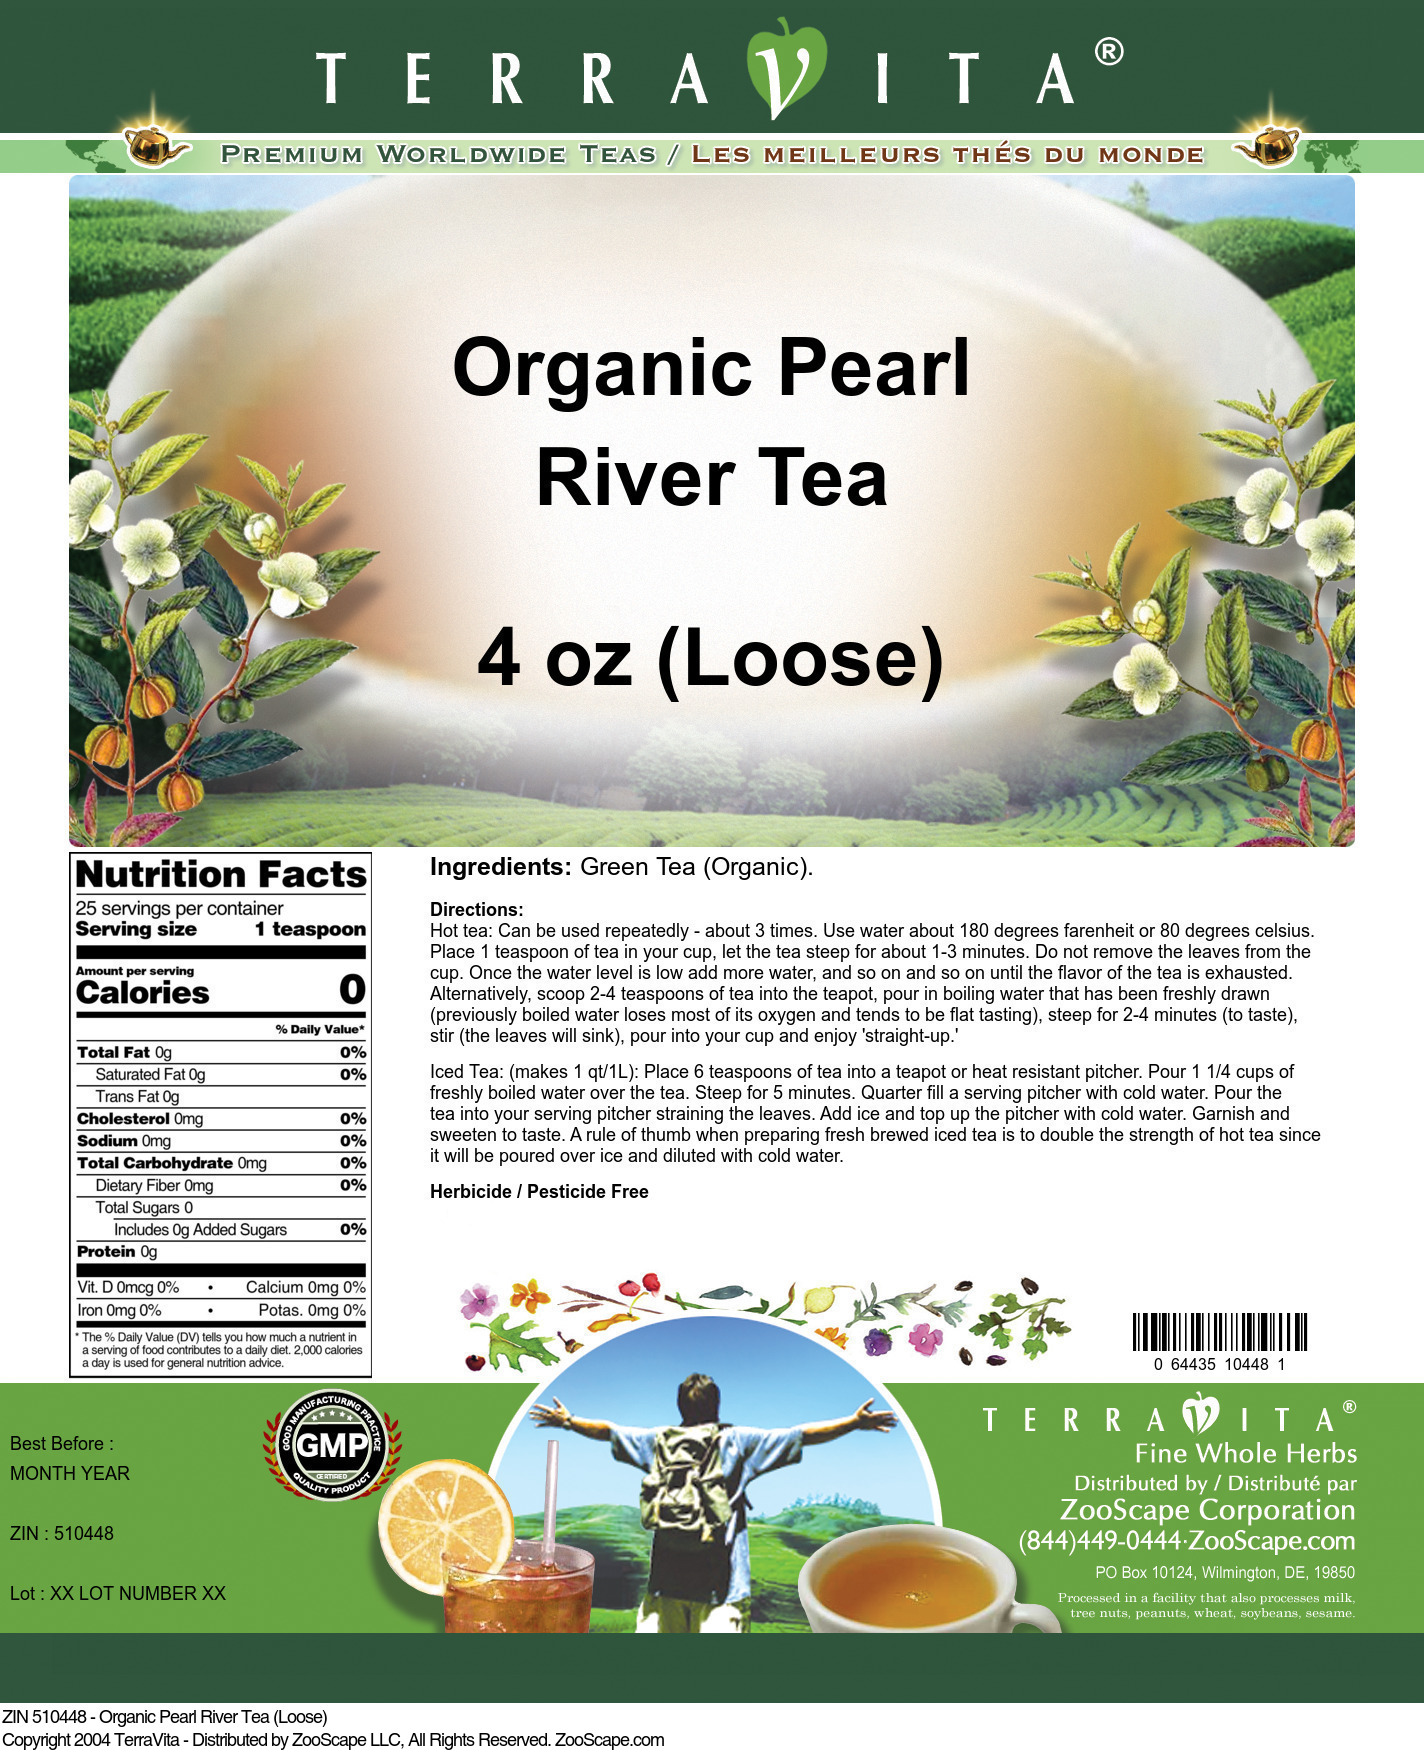 Organic Pearl River Tea (Loose)